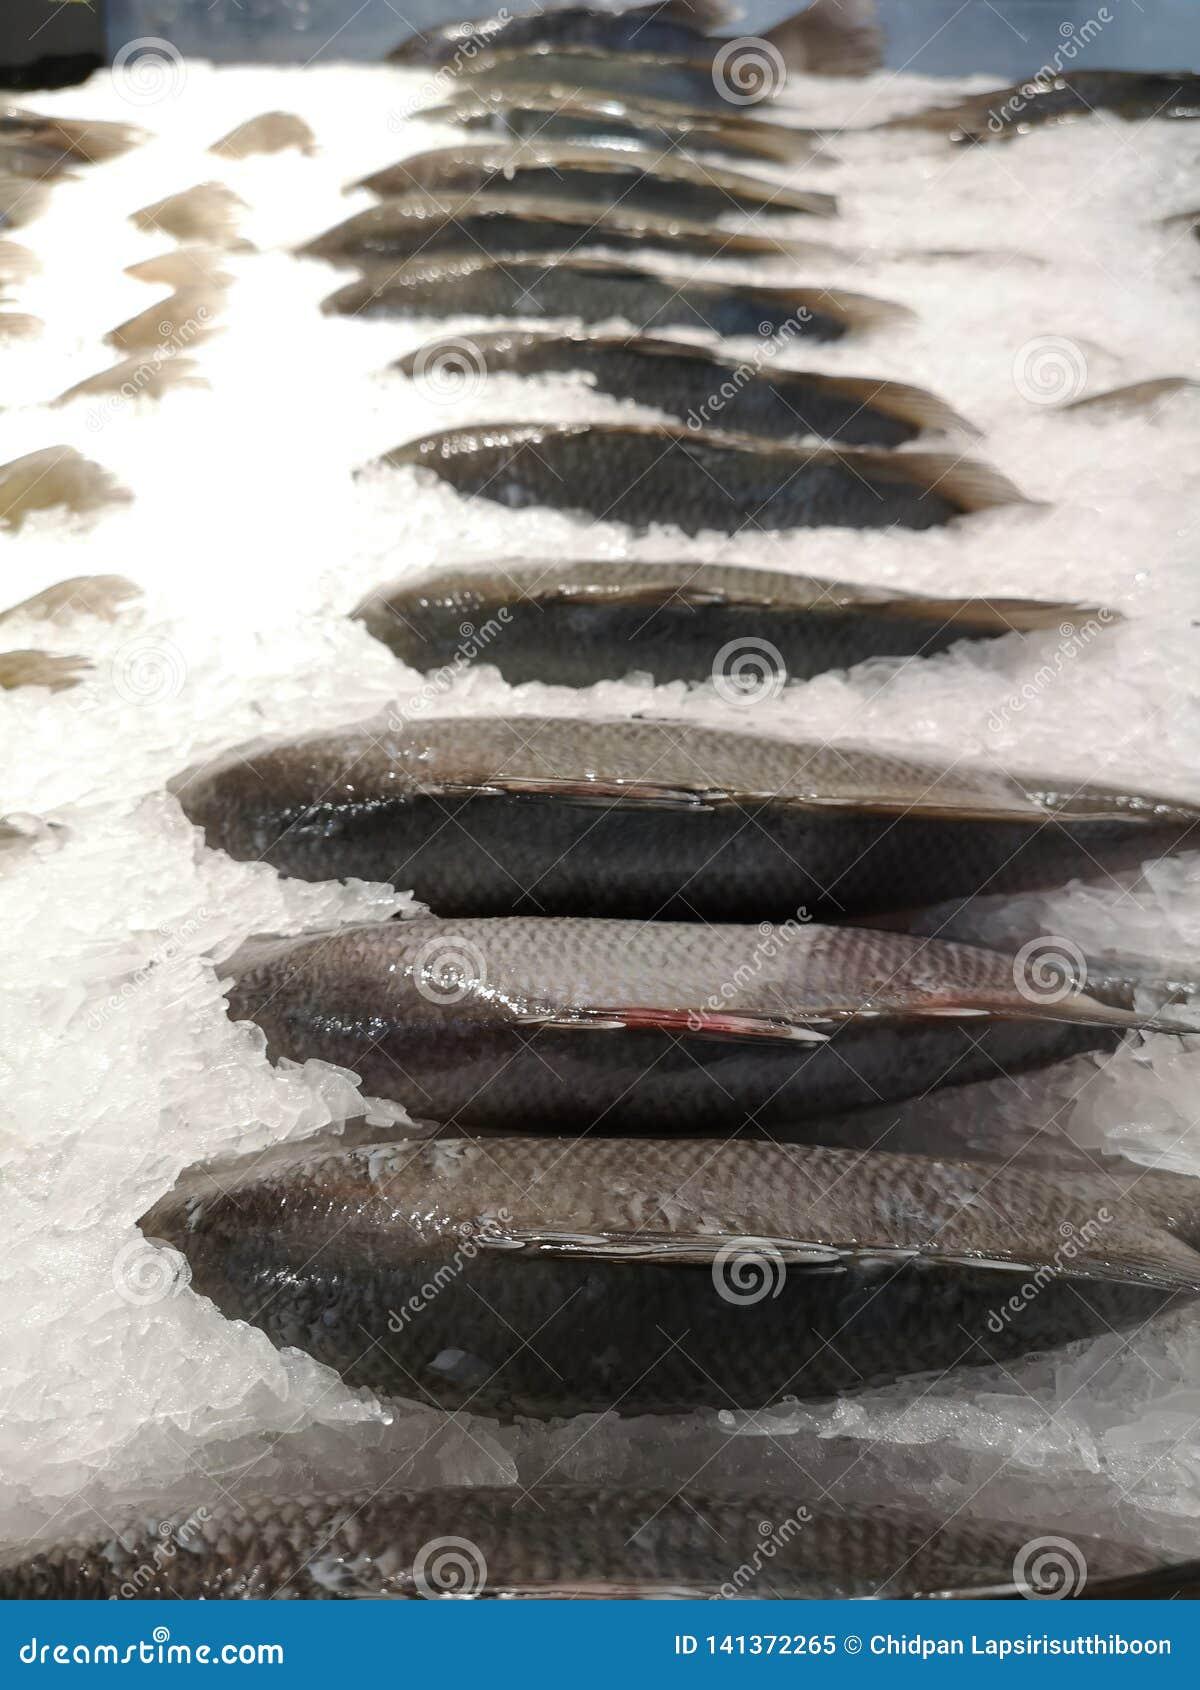 Niloticus Oreochromis fishs, φρέσκος για το μαγείρεμα της θέσης στους σωρούς πάγου στον ψυκτήρα στην υπεραγορά